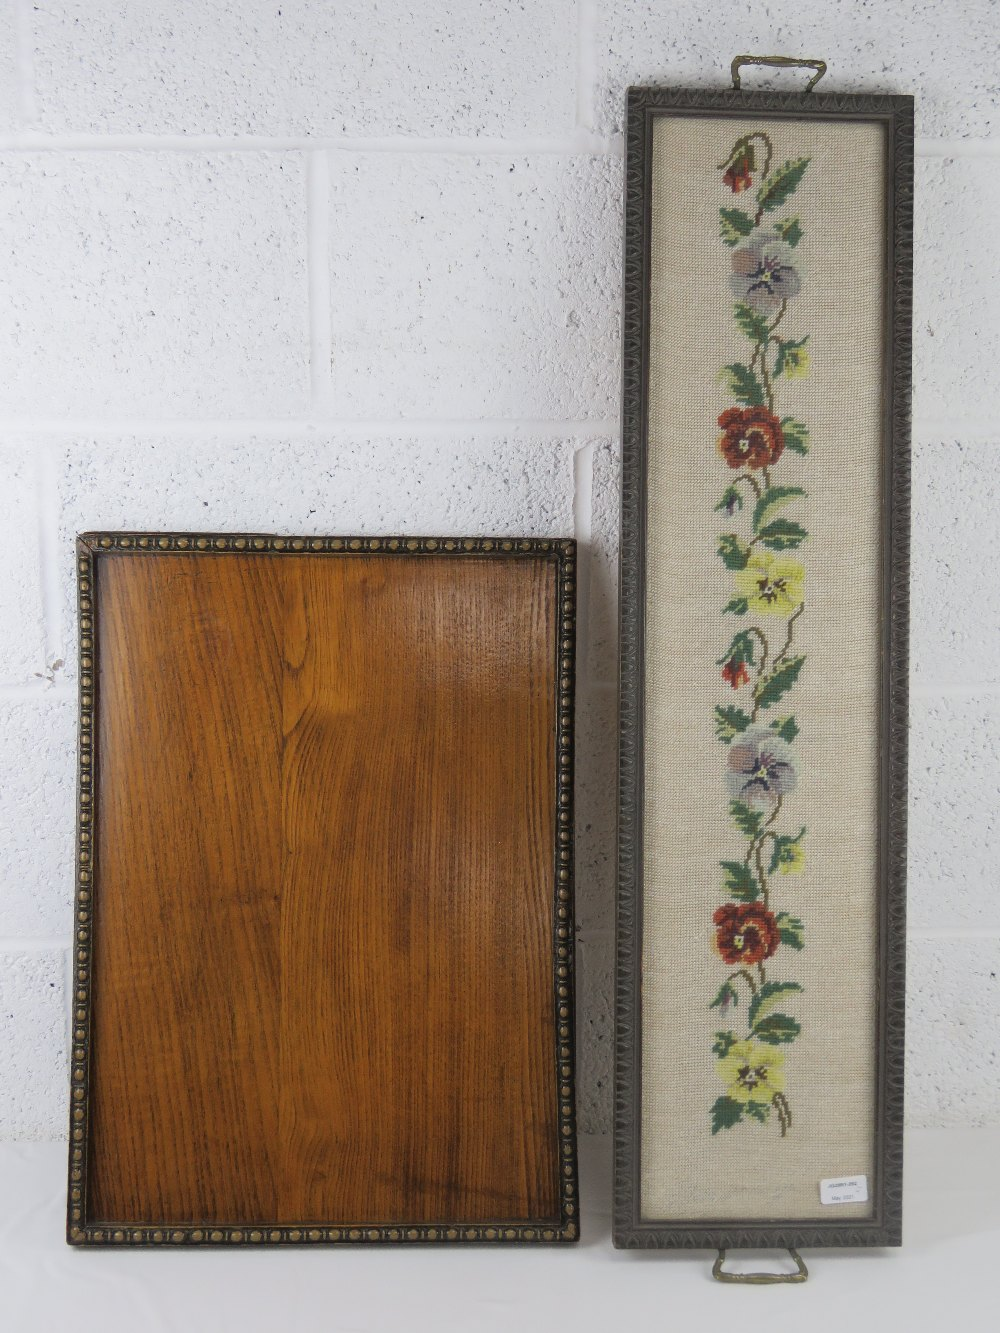 A good oak tray c1930s, measuring 58 x 4